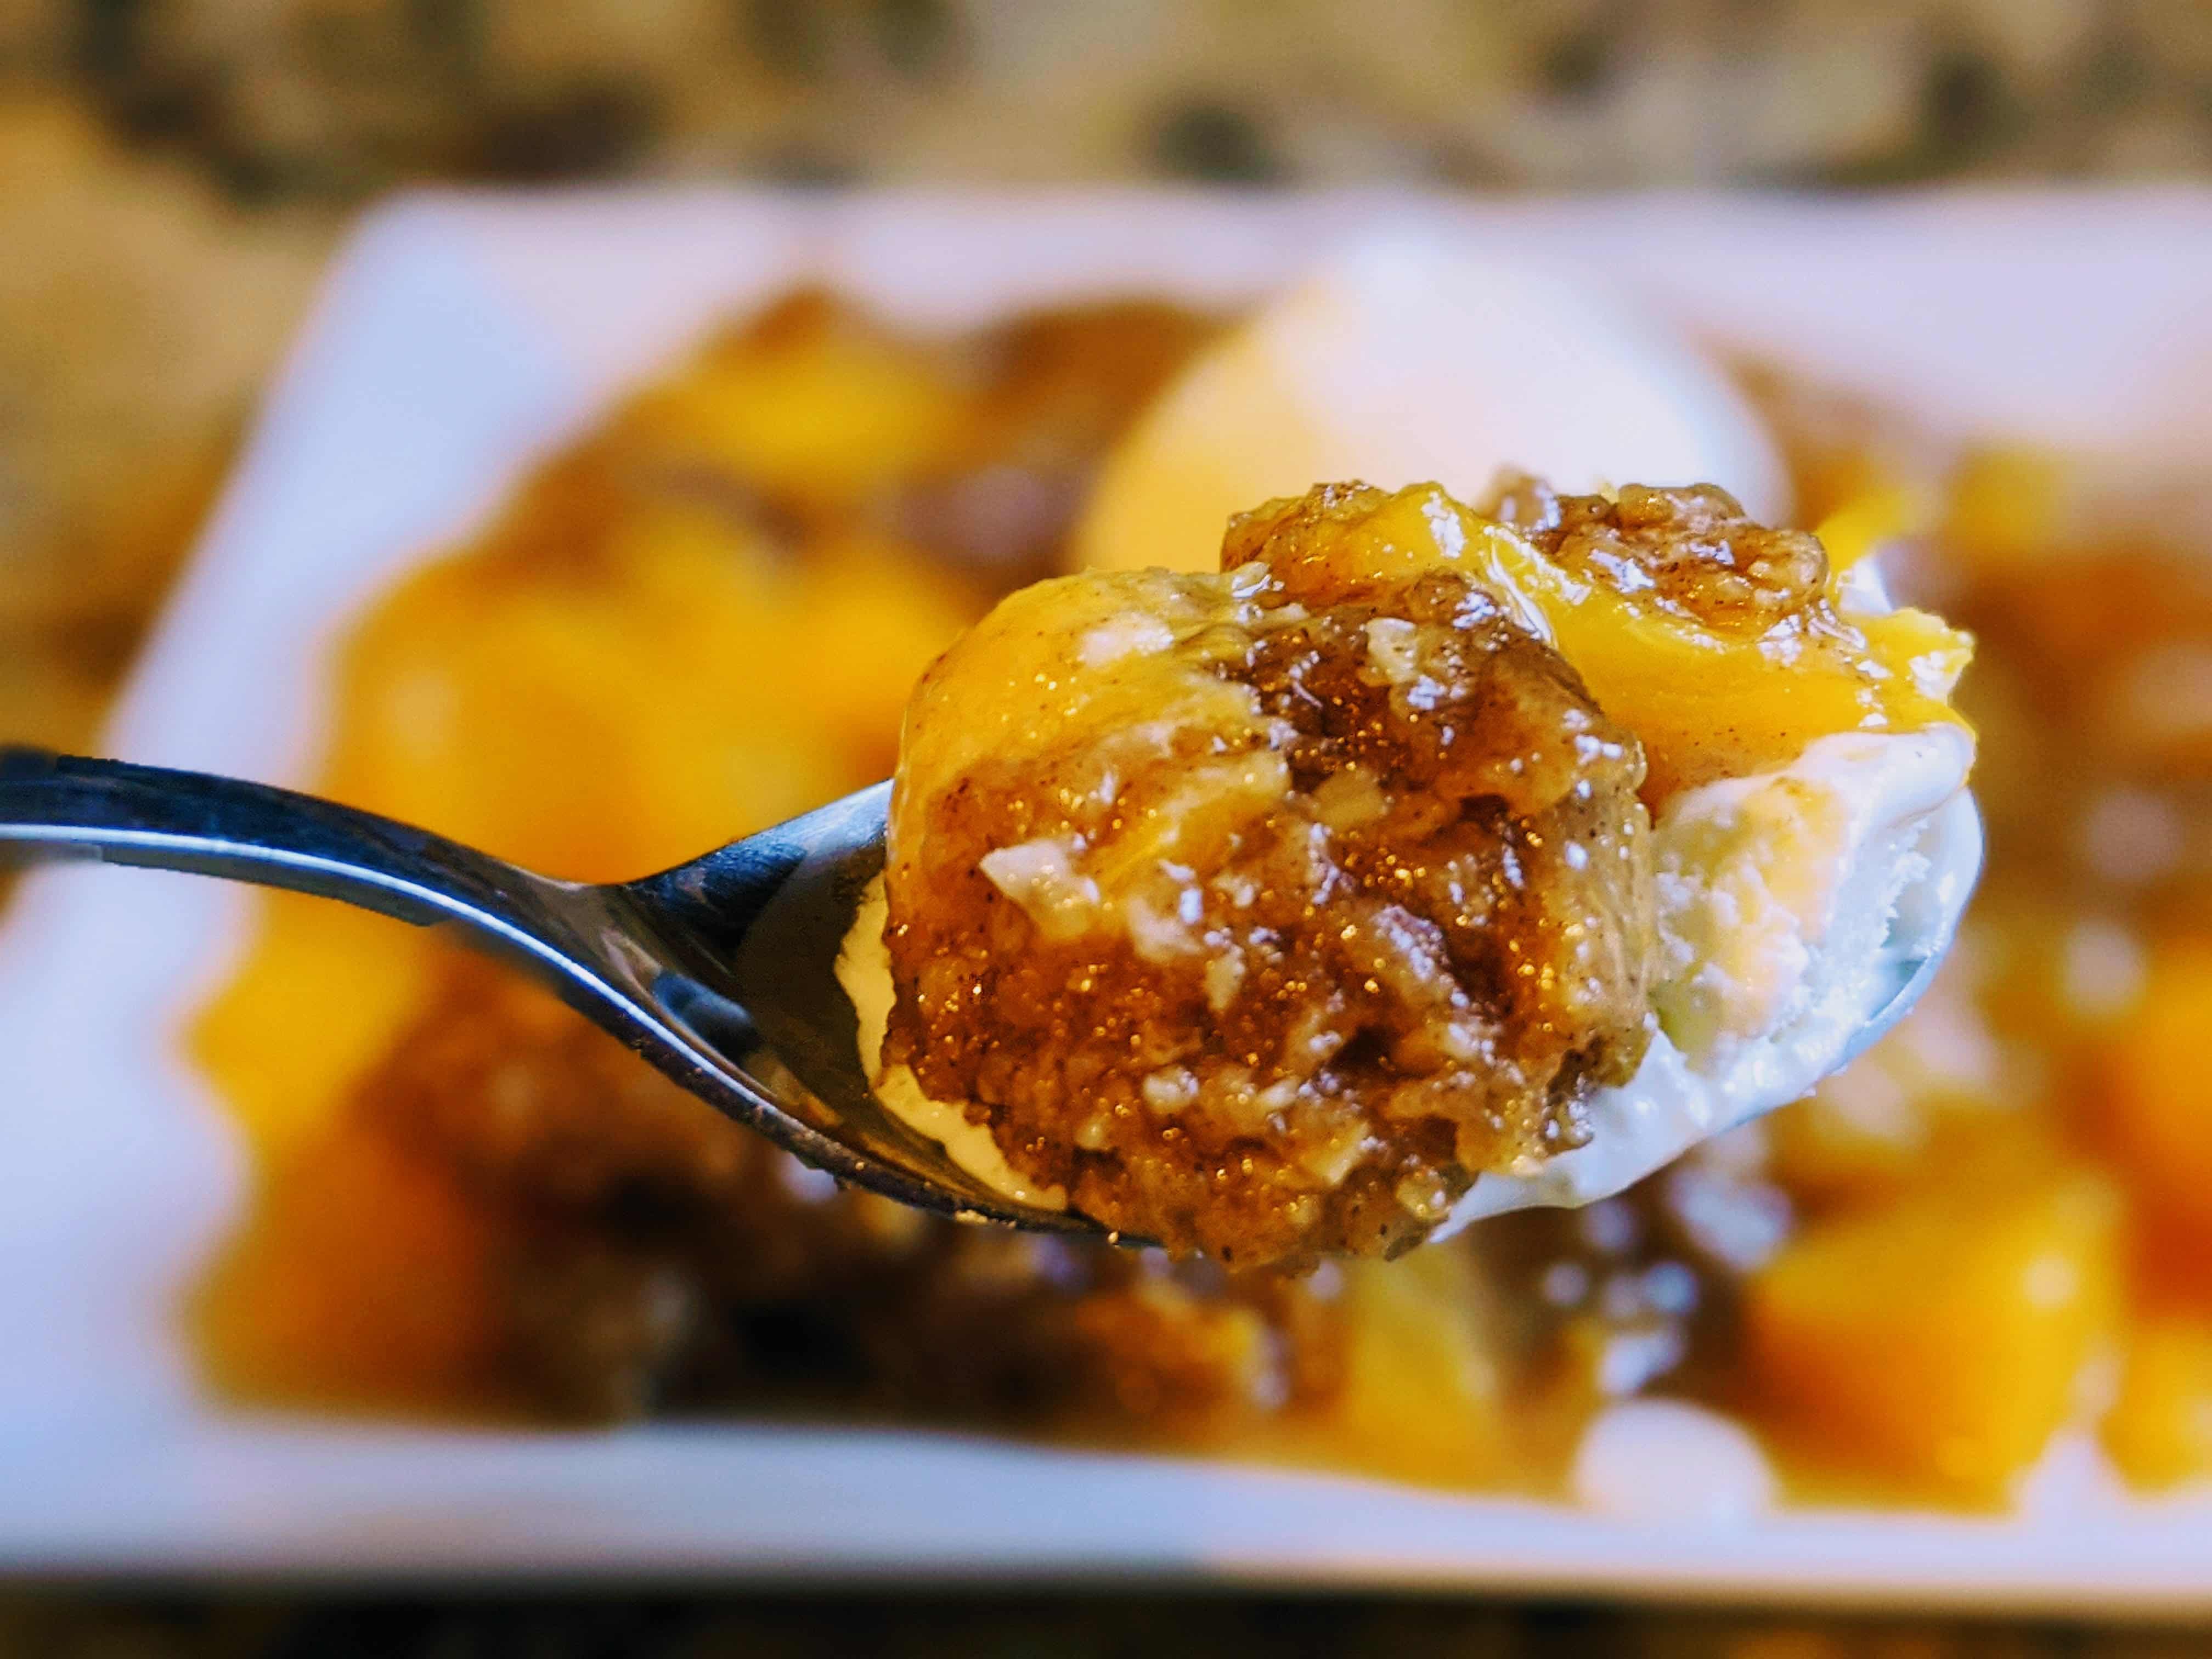 spoonful of peach crisp